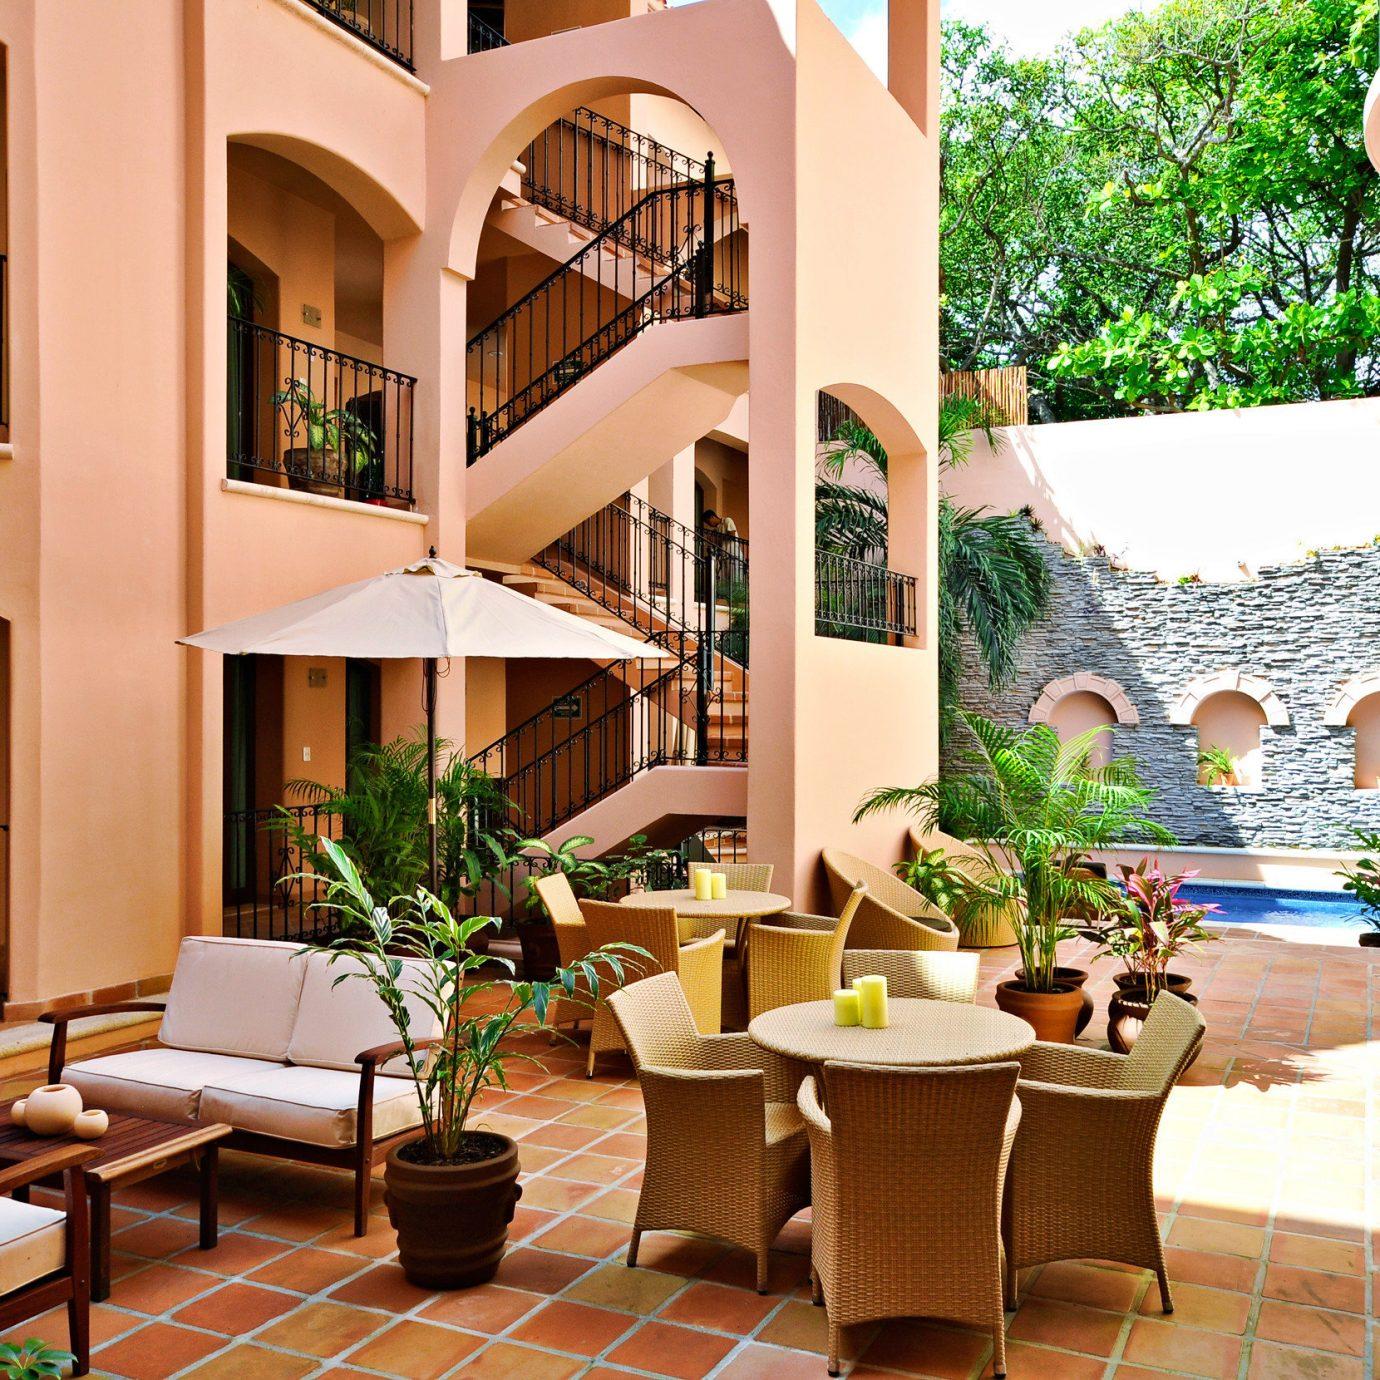 Dining Lounge Patio chair property home Resort condominium Lobby living room Villa Courtyard